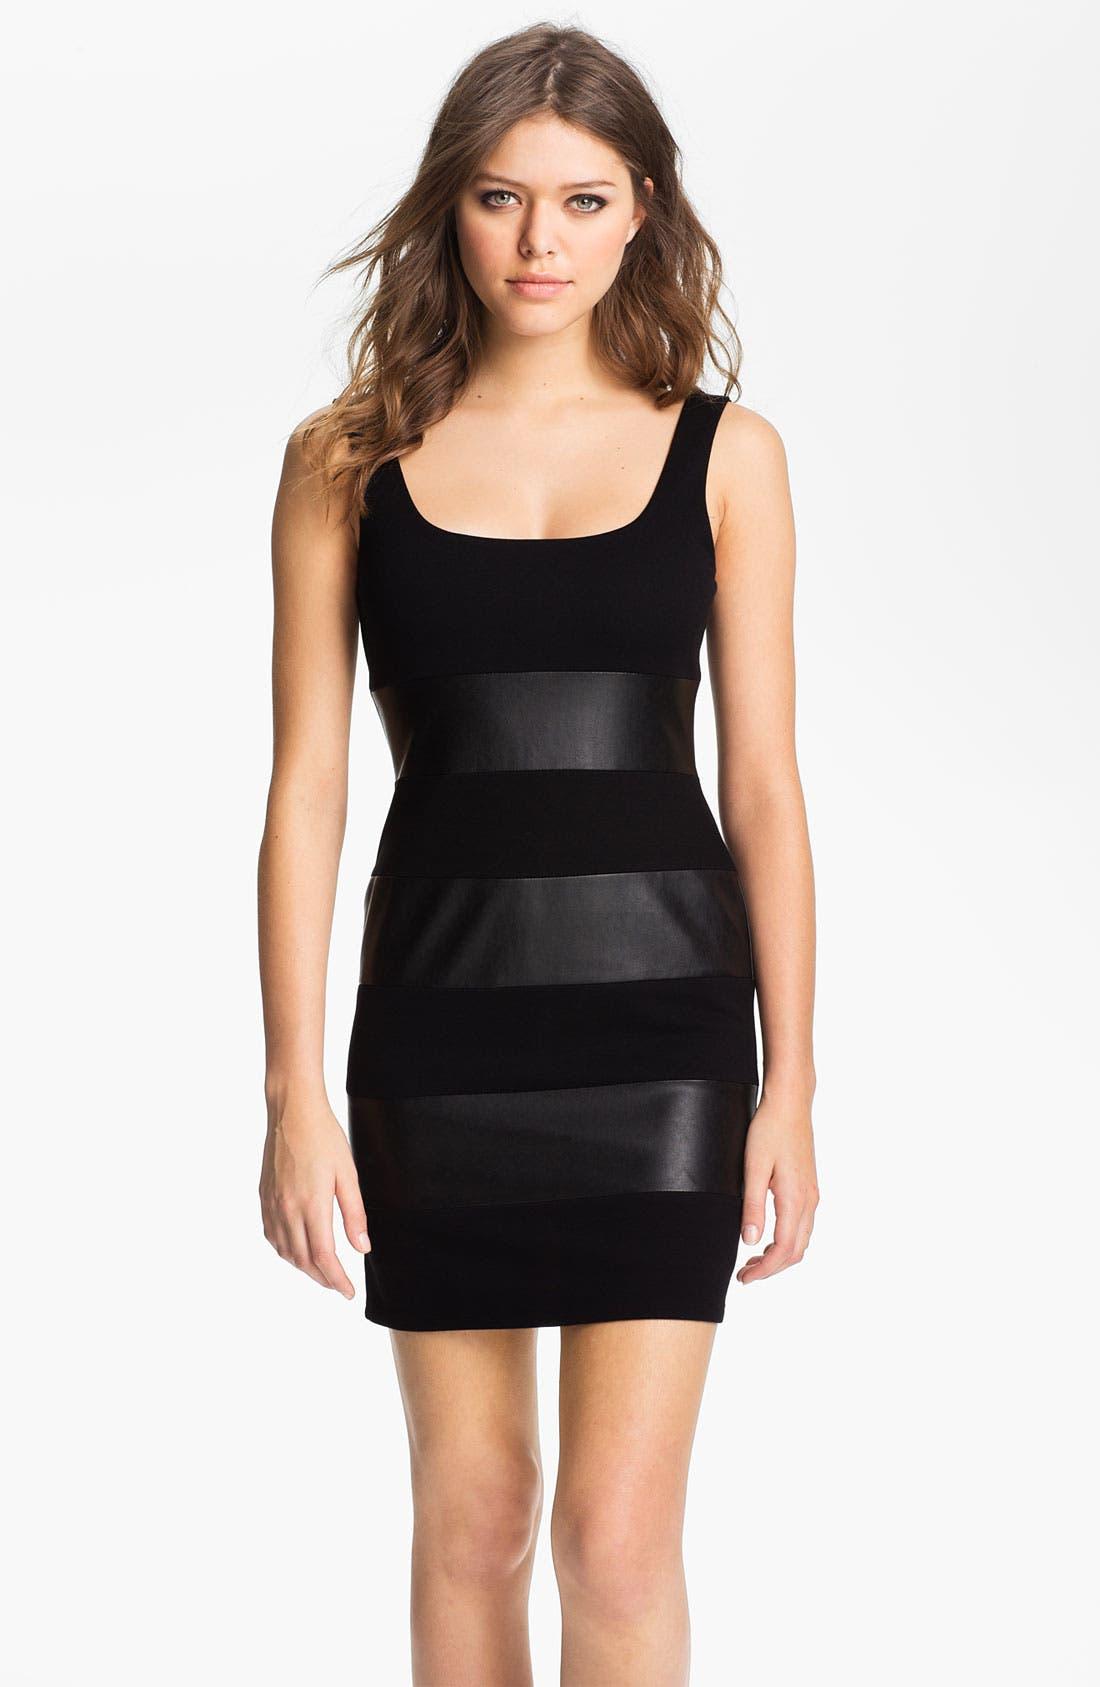 Main Image - B44 Dressed by Bailey 44 'Little Black Dress' Faux Leather Stripe Tank Dress